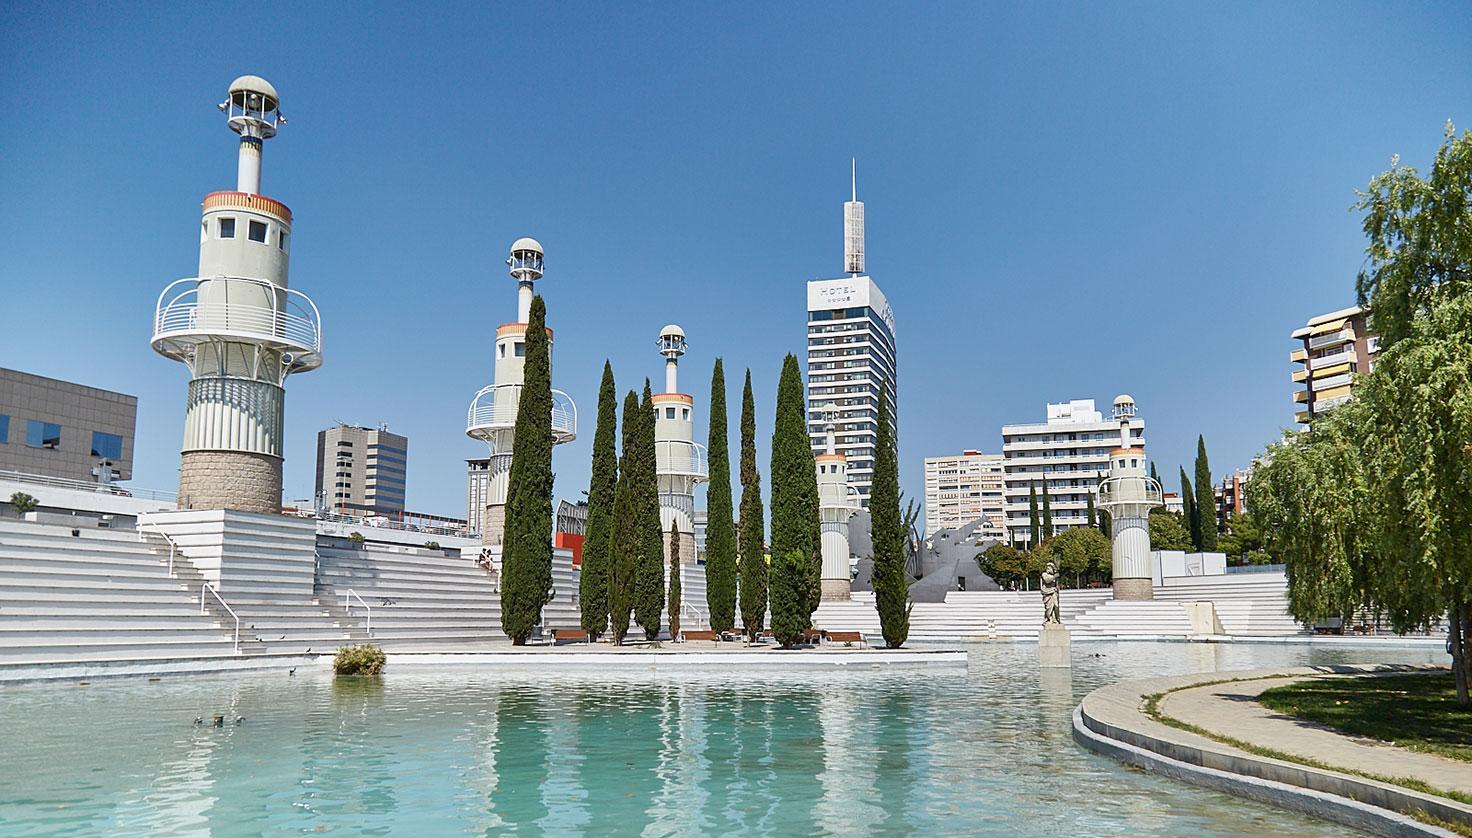 Photo Espanya Industrial Park - Monserrat Ruiz